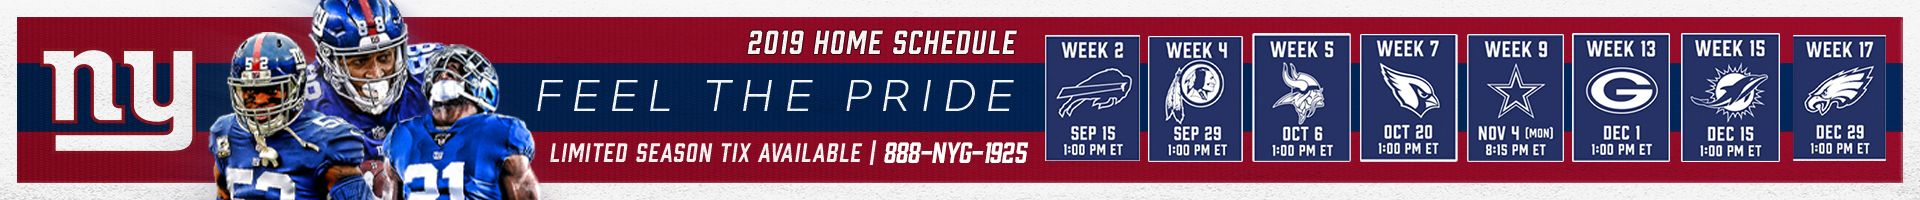 NYG_Feel_The_Pride_Schedule_1920x200_v1A